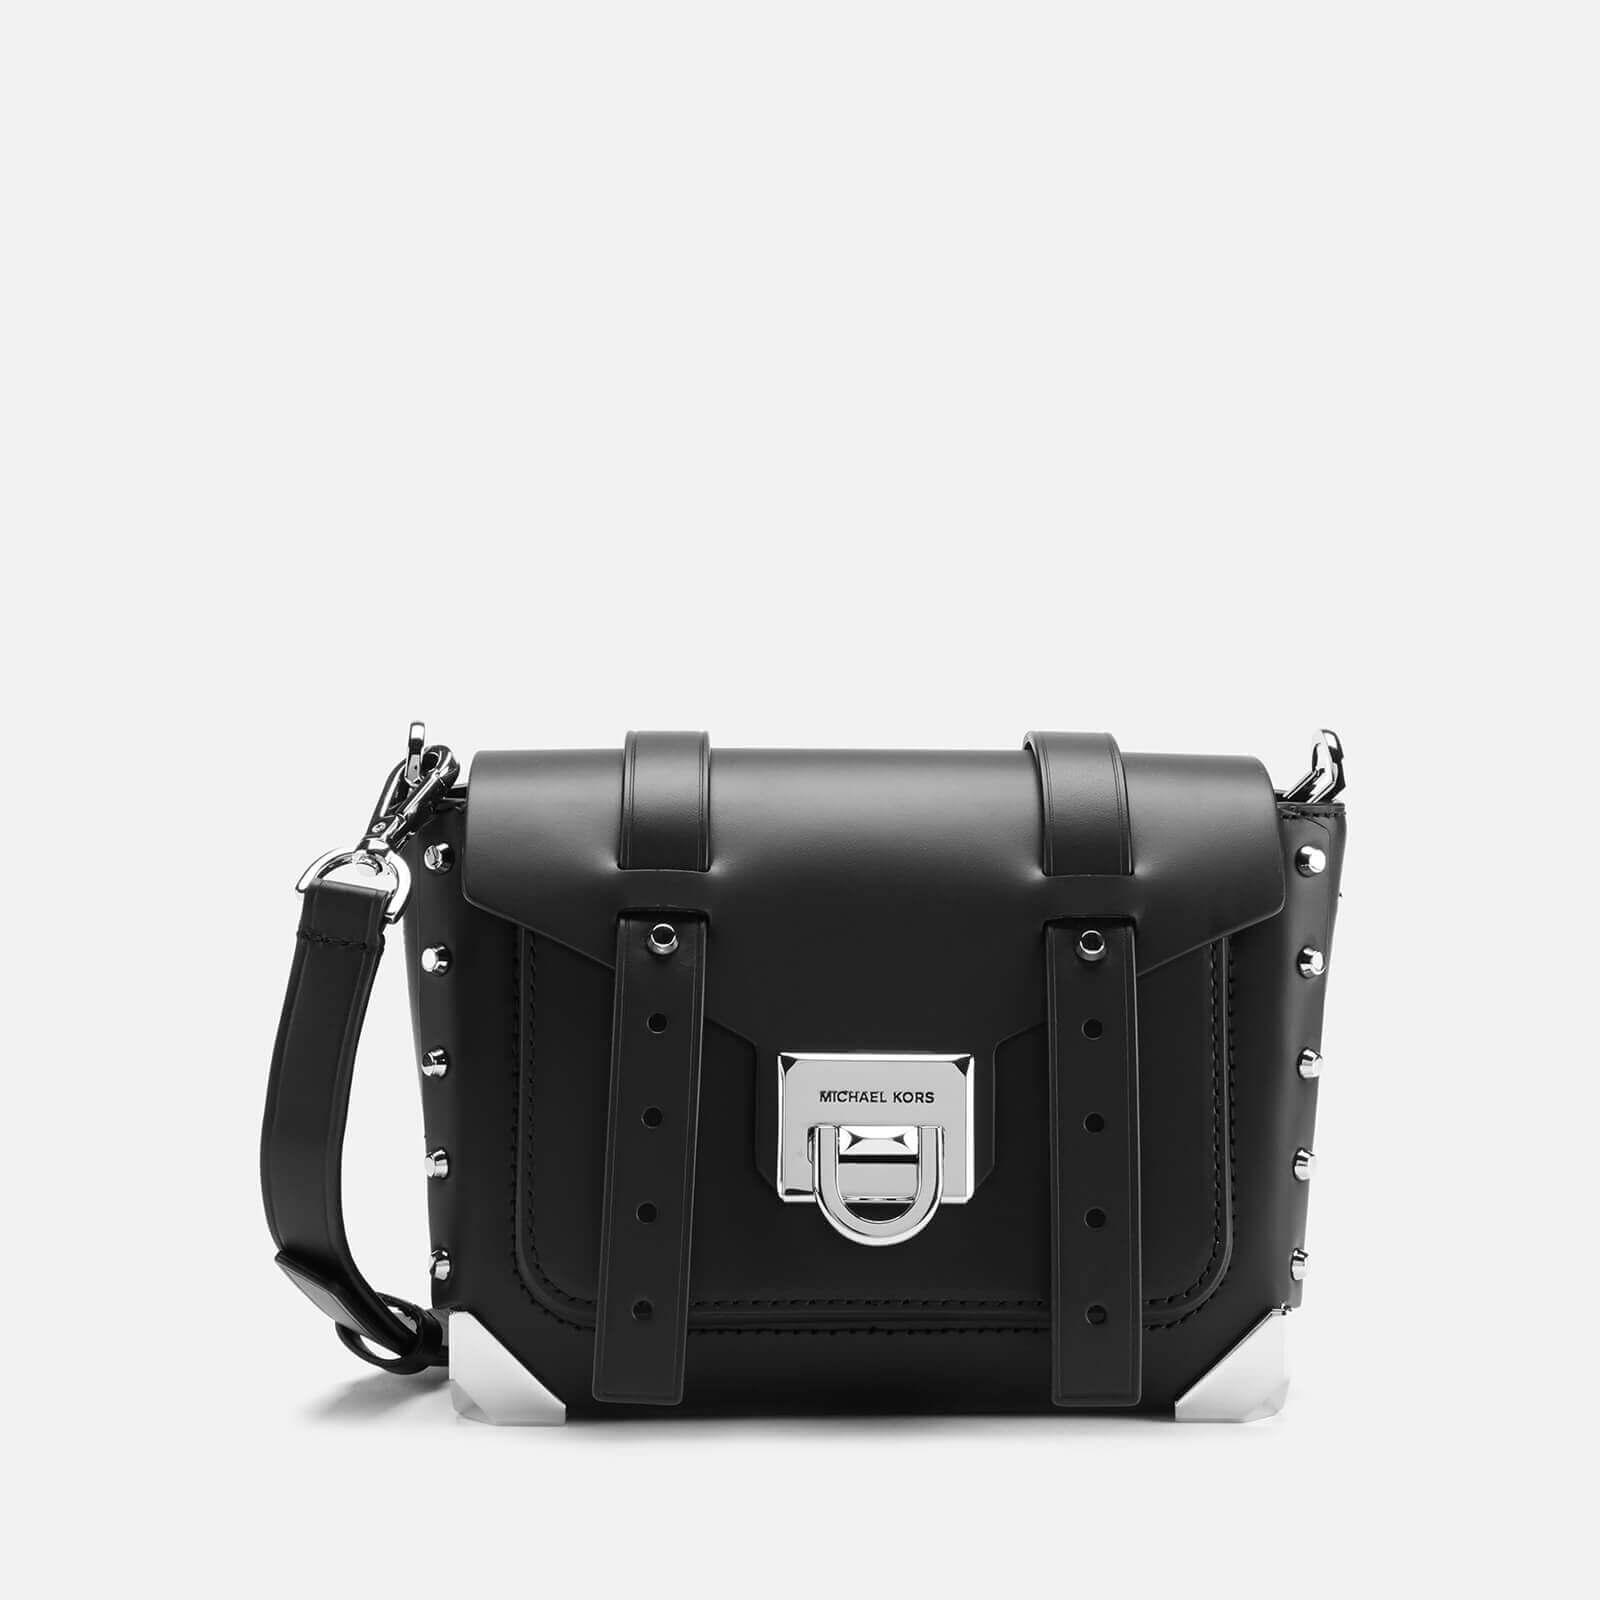 MICHAEL MICHAEL KORS Women's Manhattan Small Messenger Bag - Black